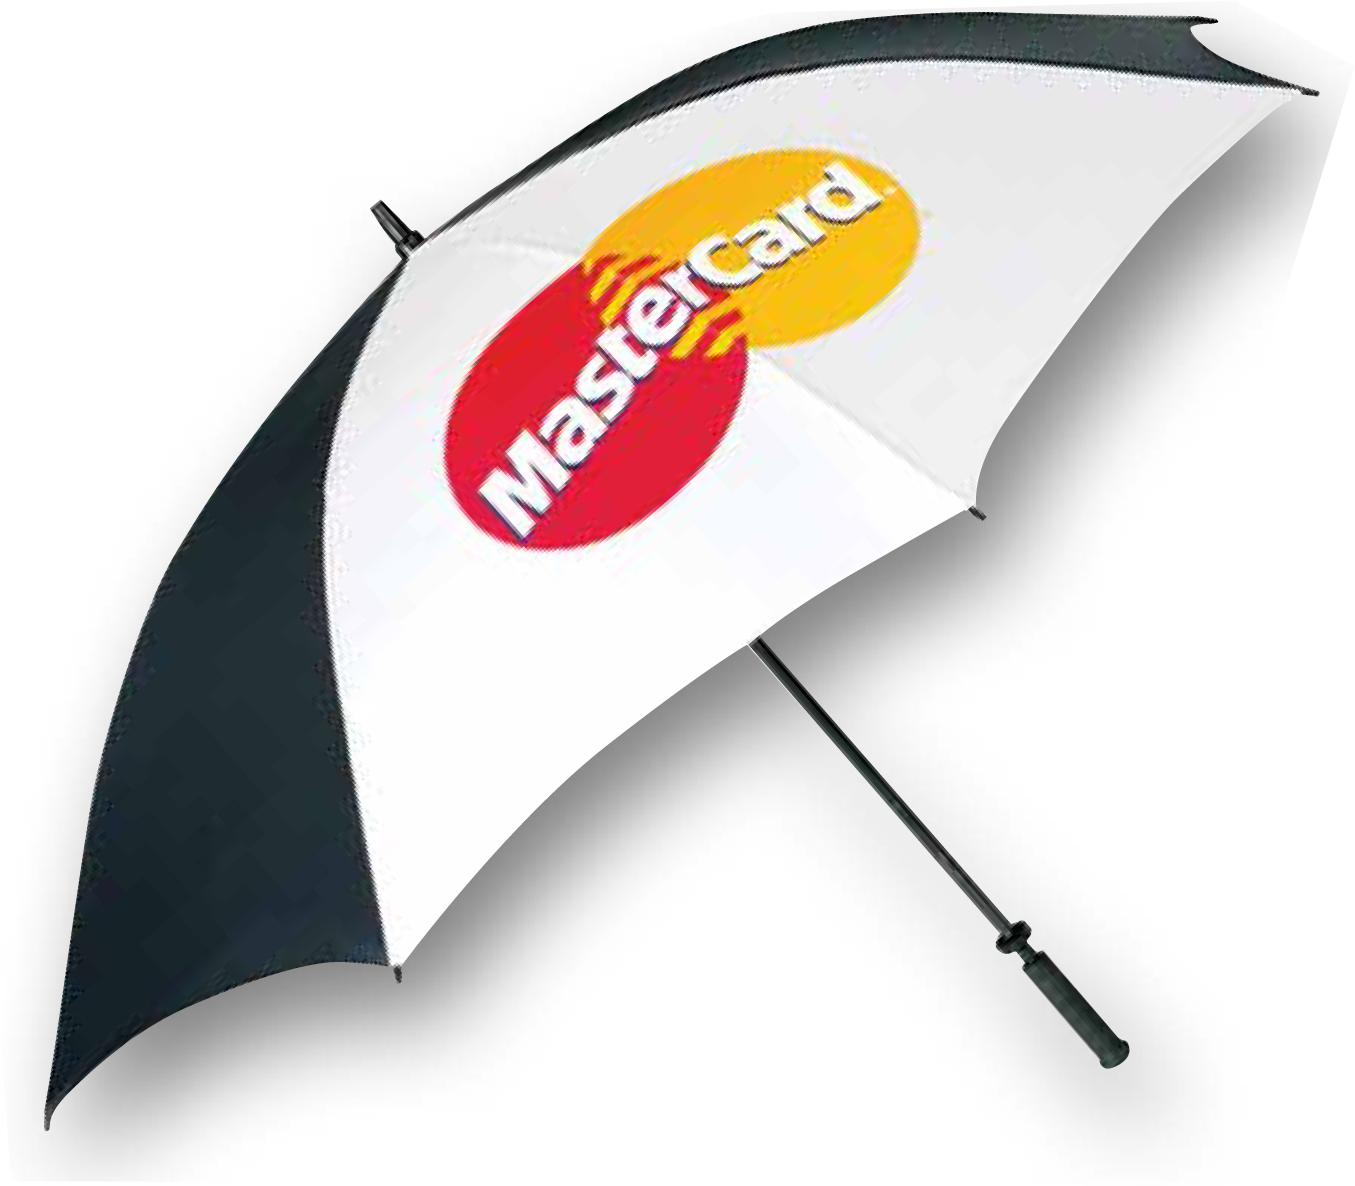 https://www.best4balls.com/pub/media/catalog/product/s/p/special-order-titleist-umbrella.jpg